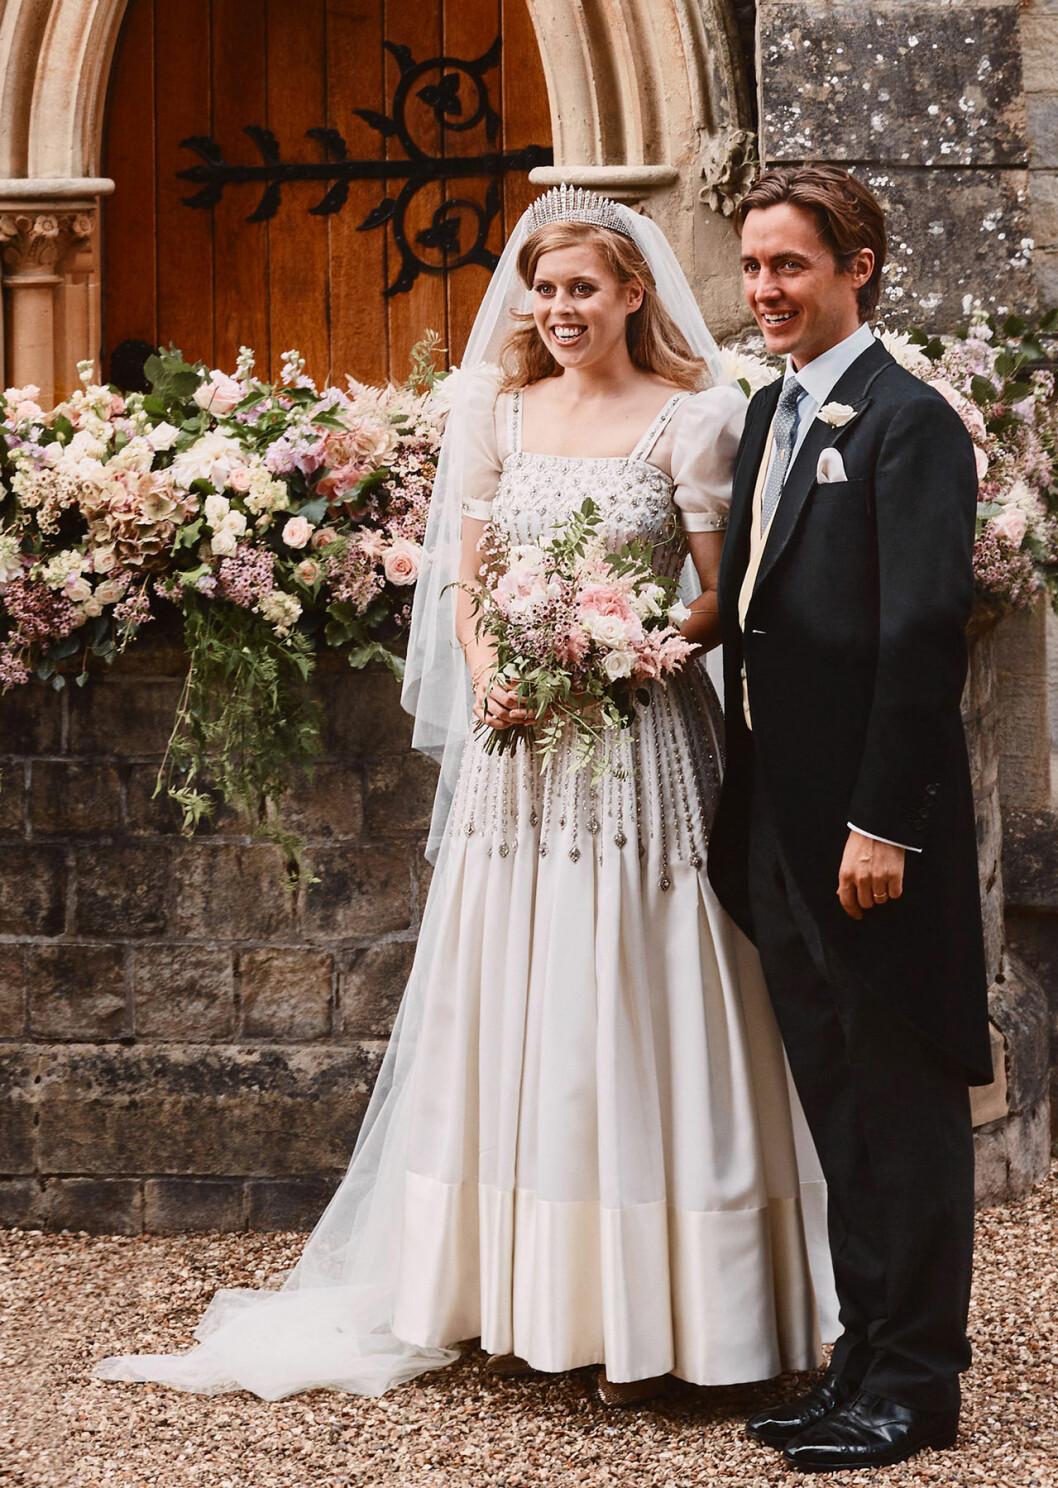 Prinsessan Beatrice och Edoardo Mapelli Mozzis bröllop.